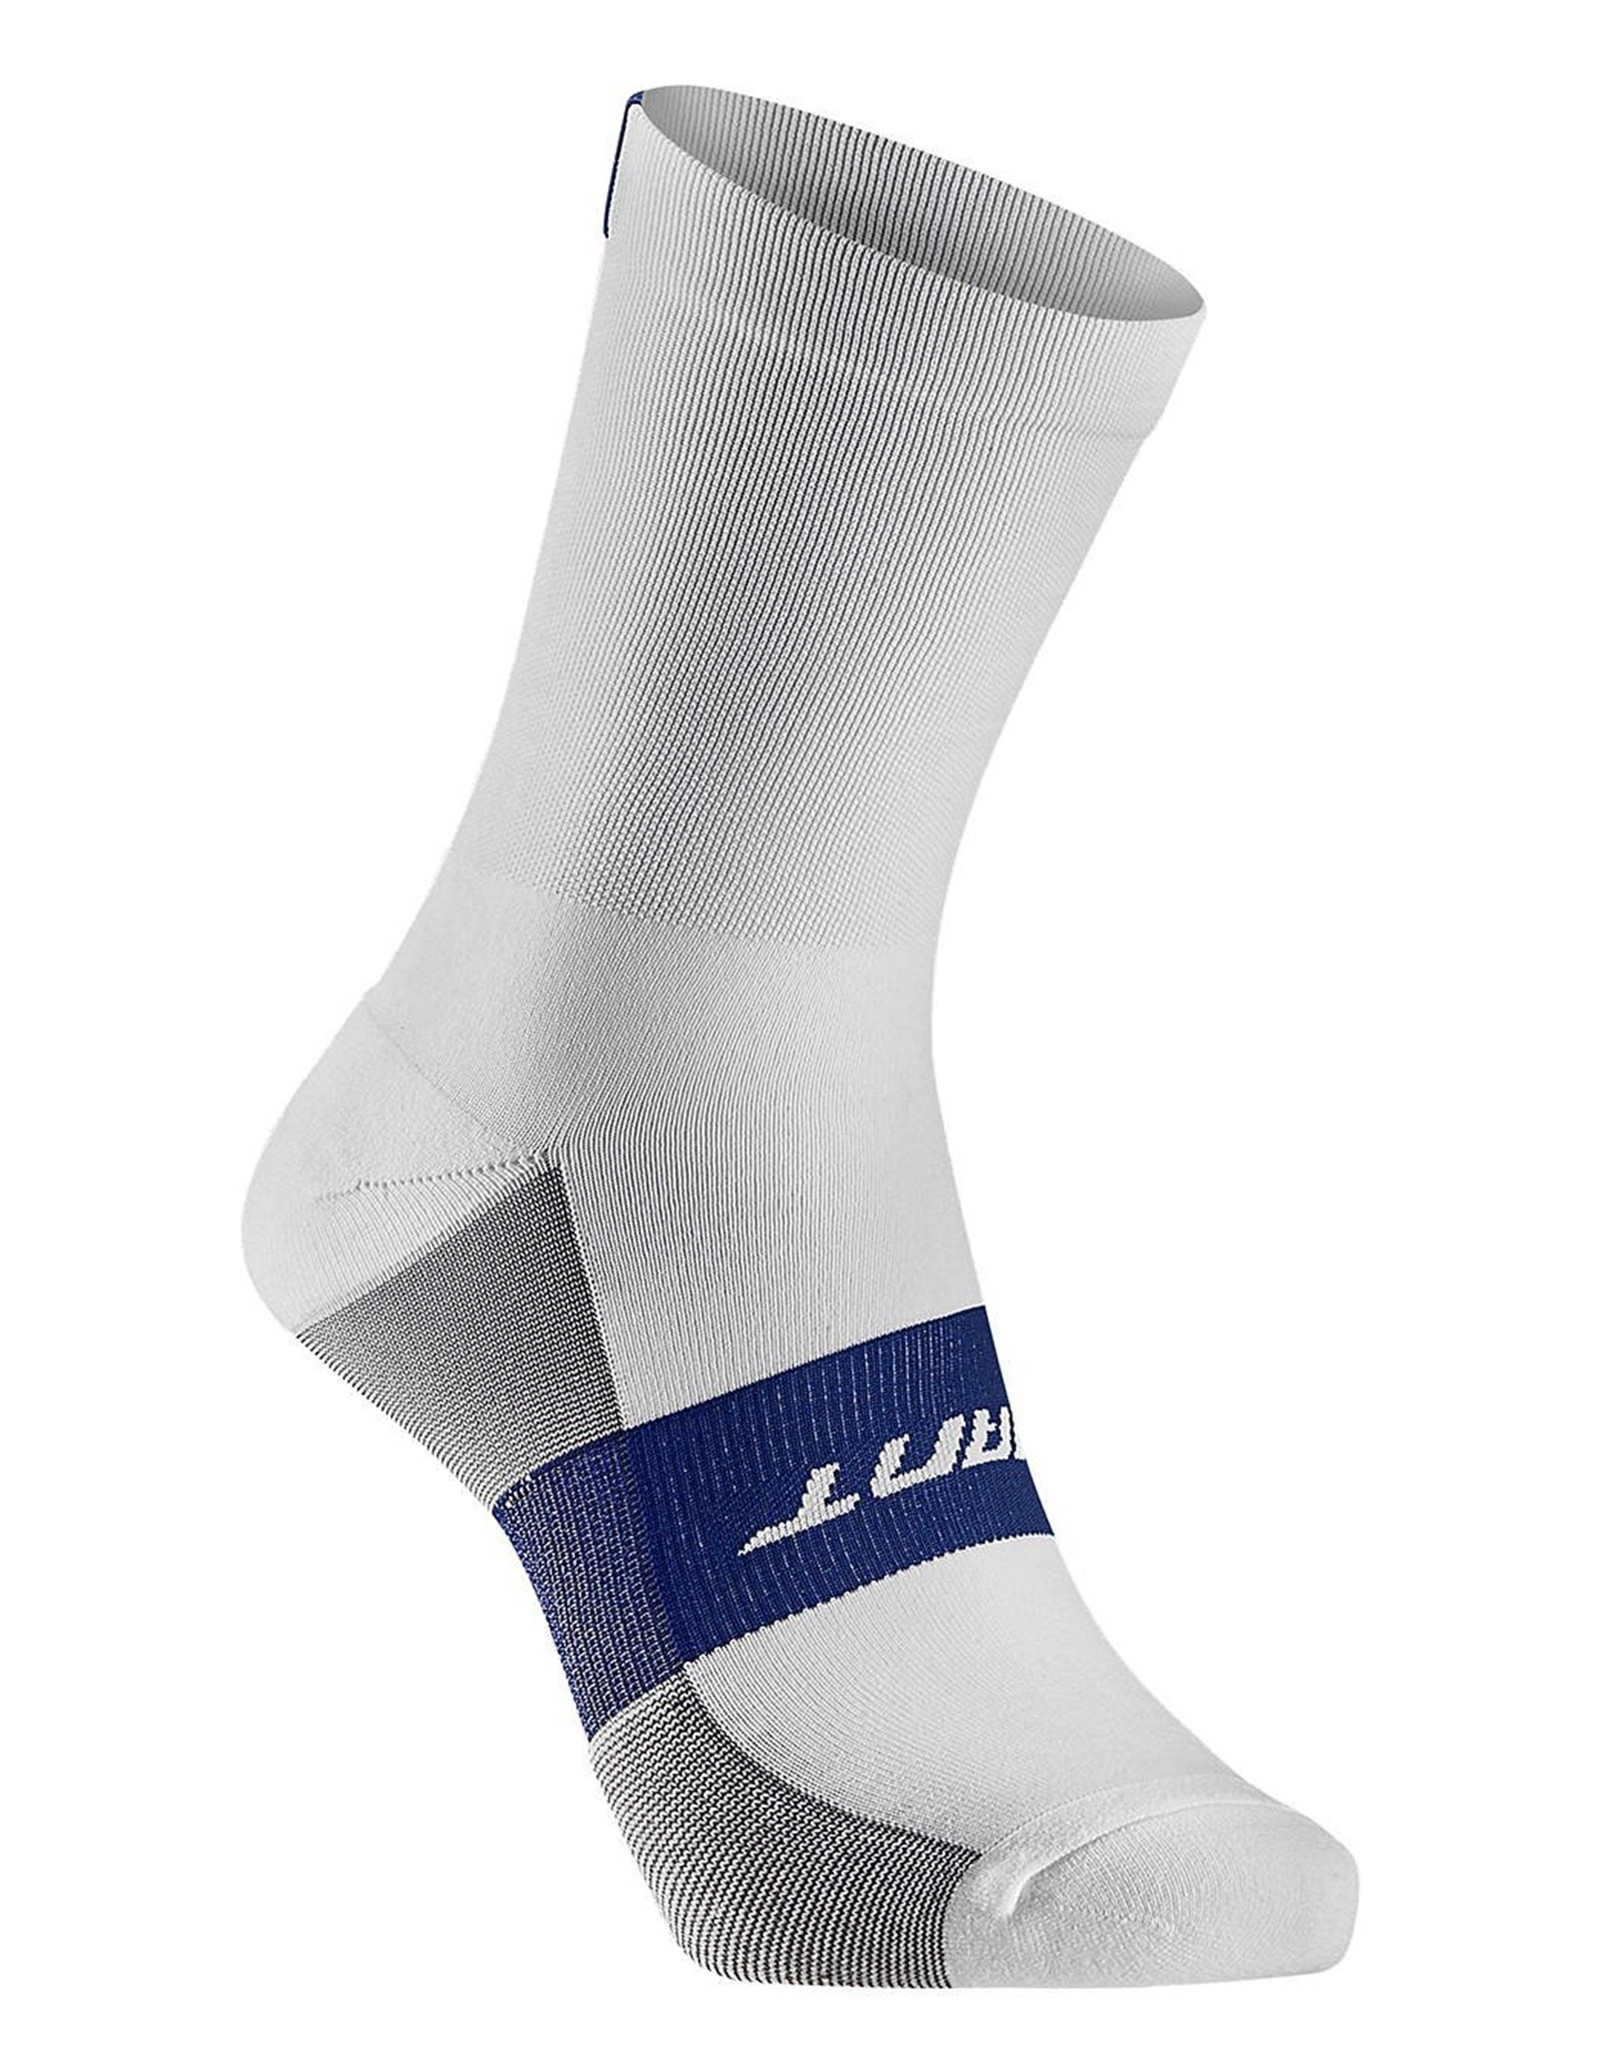 GIANT Giant Elevate Socks White L 43-46